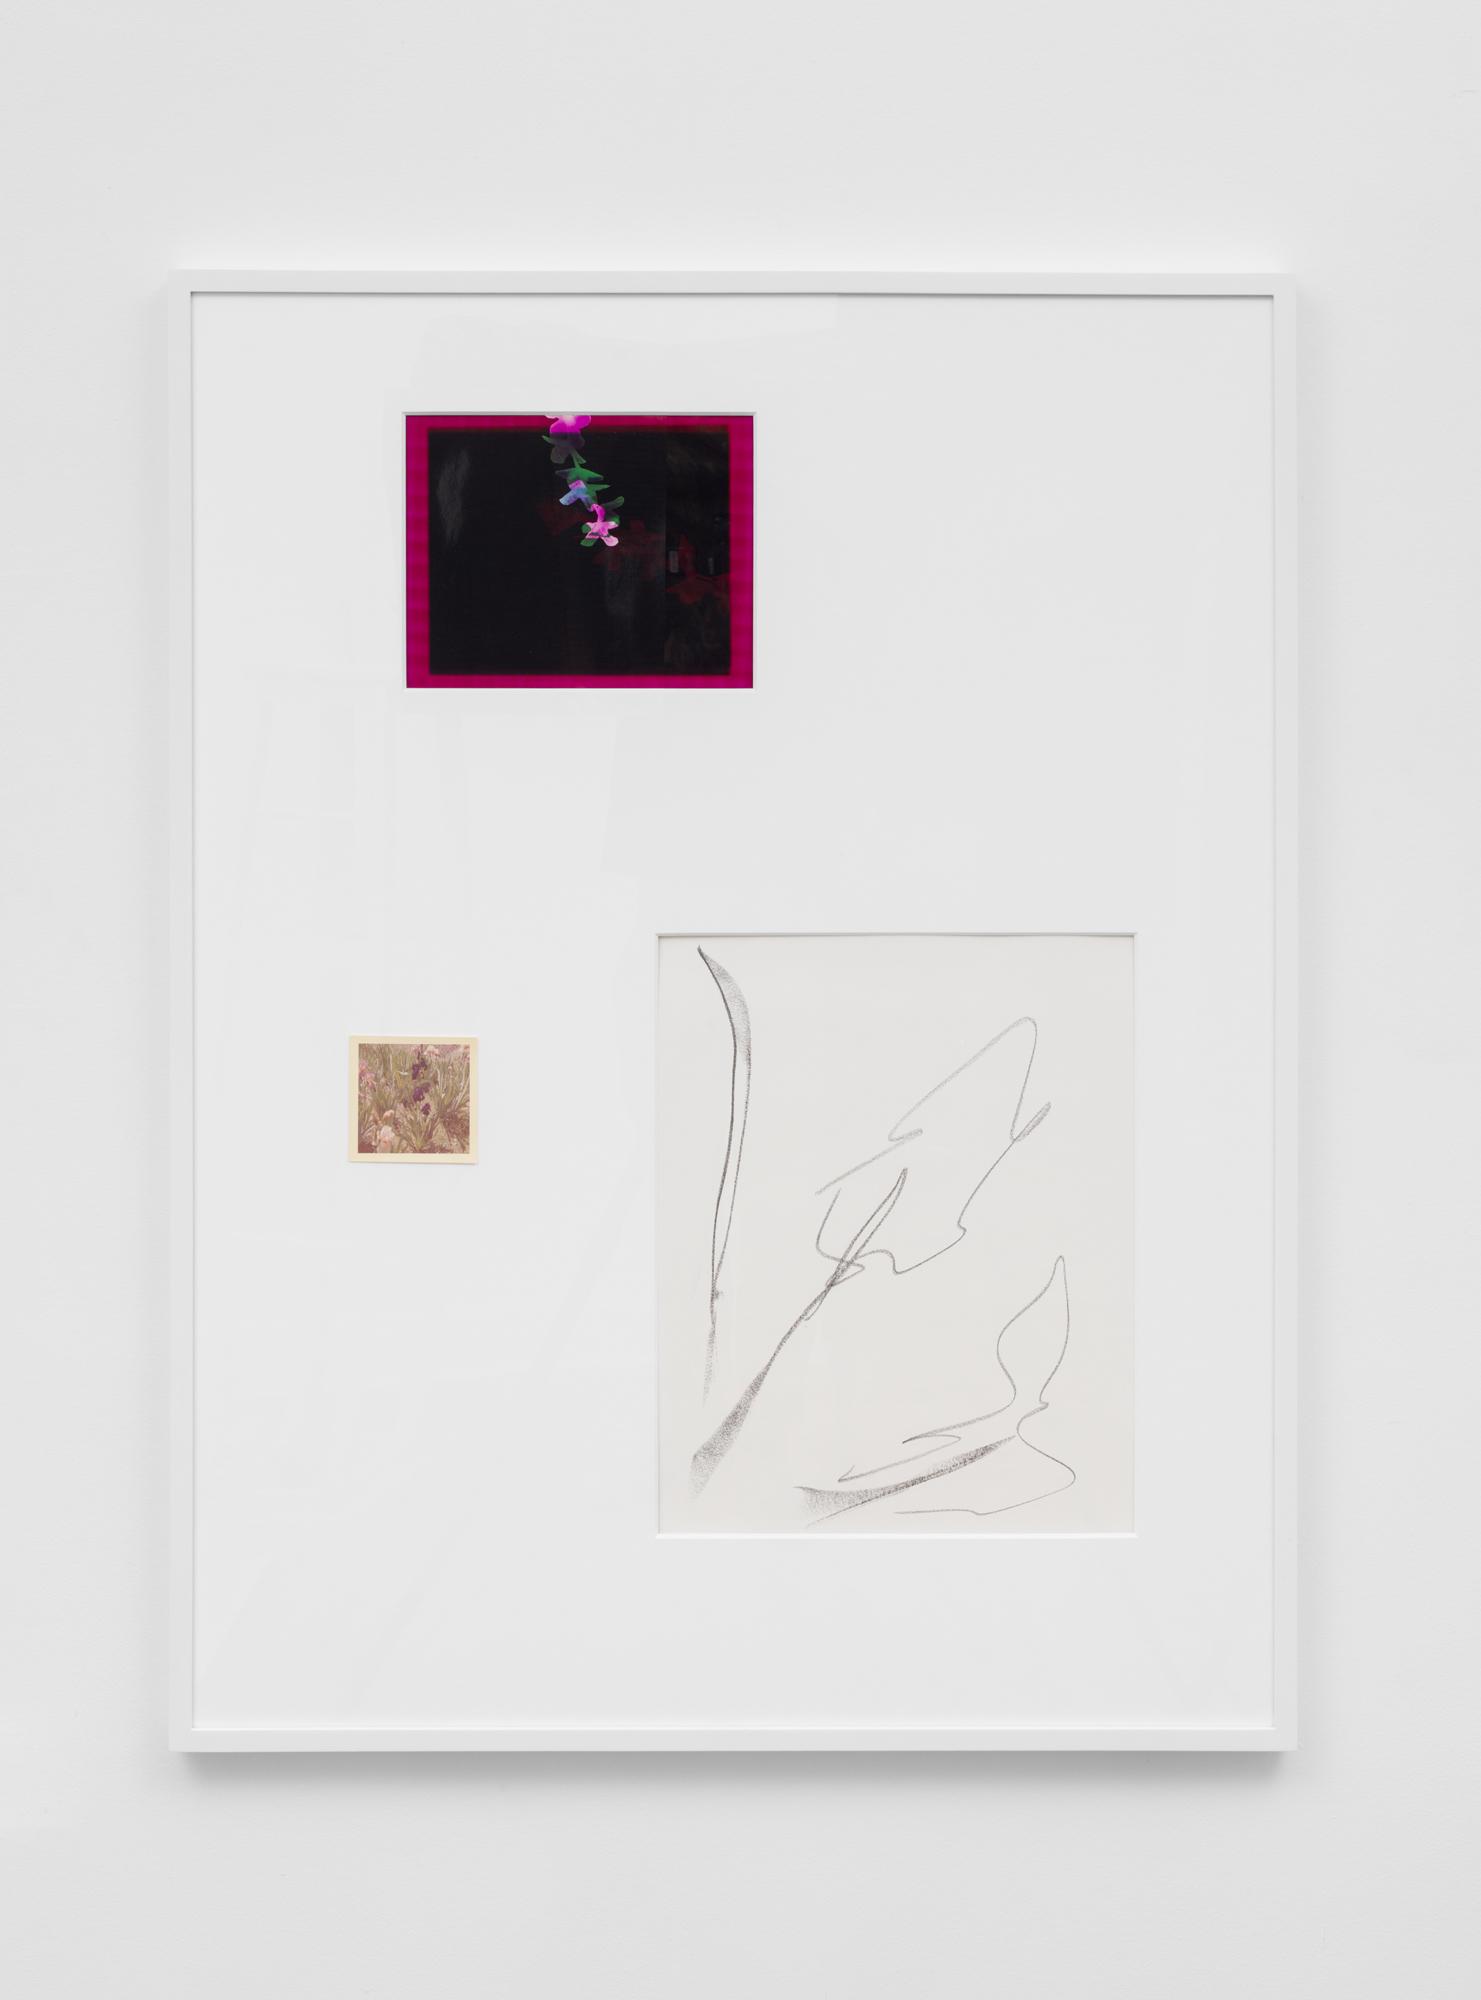 Connor McNicholas  Field Guide , 2017 Found polaroid, graphite on paper, photogram, wood frame, plexiglass, paint 40 x 30 inches (102 x 76 cm) CM5